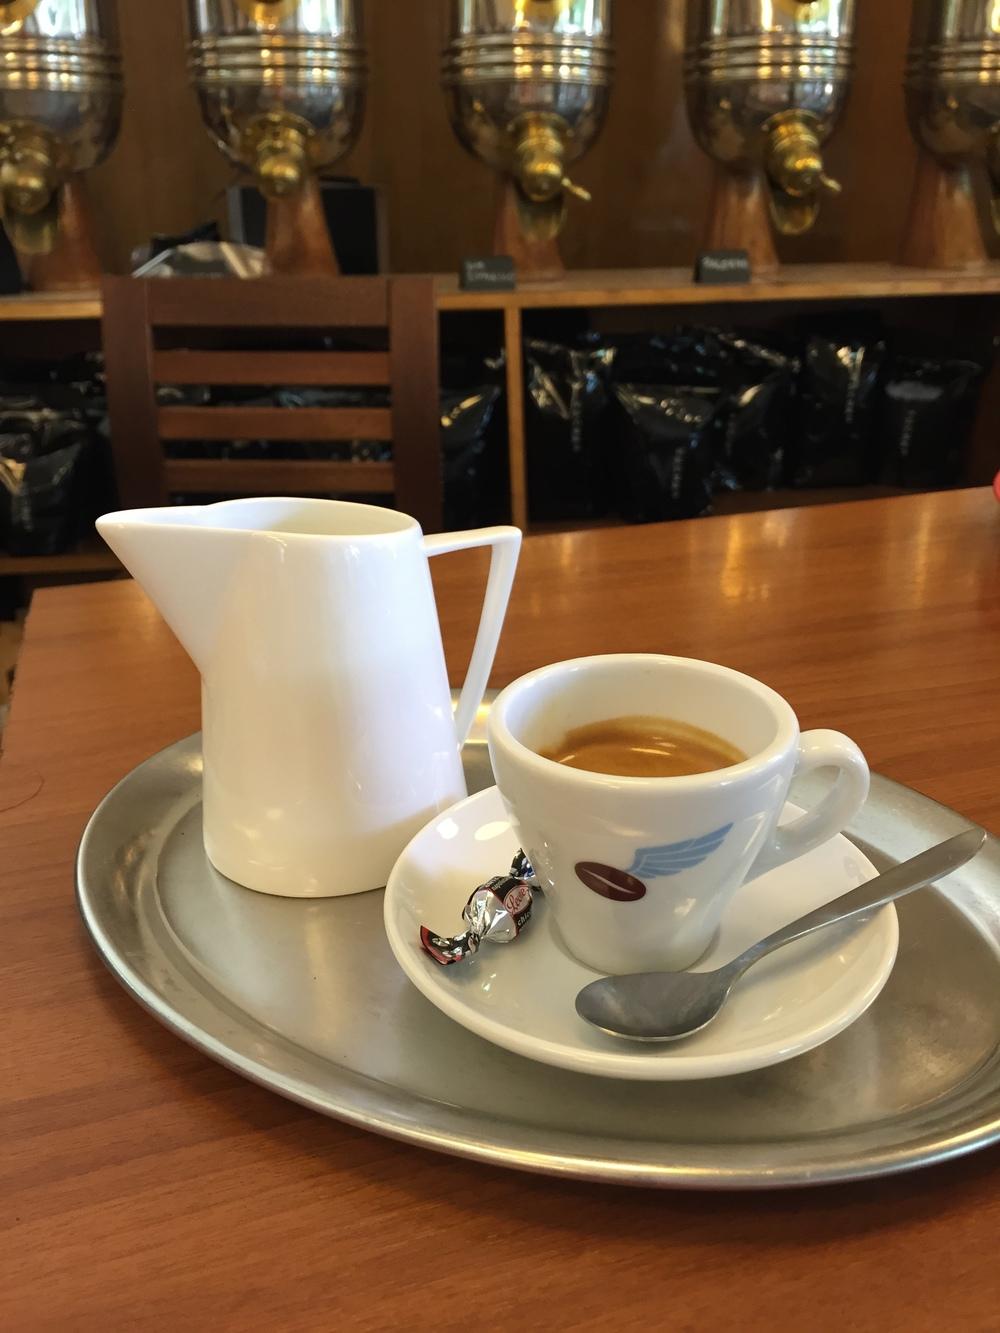 Verlängerter/Caffè Americano im Schönbergers